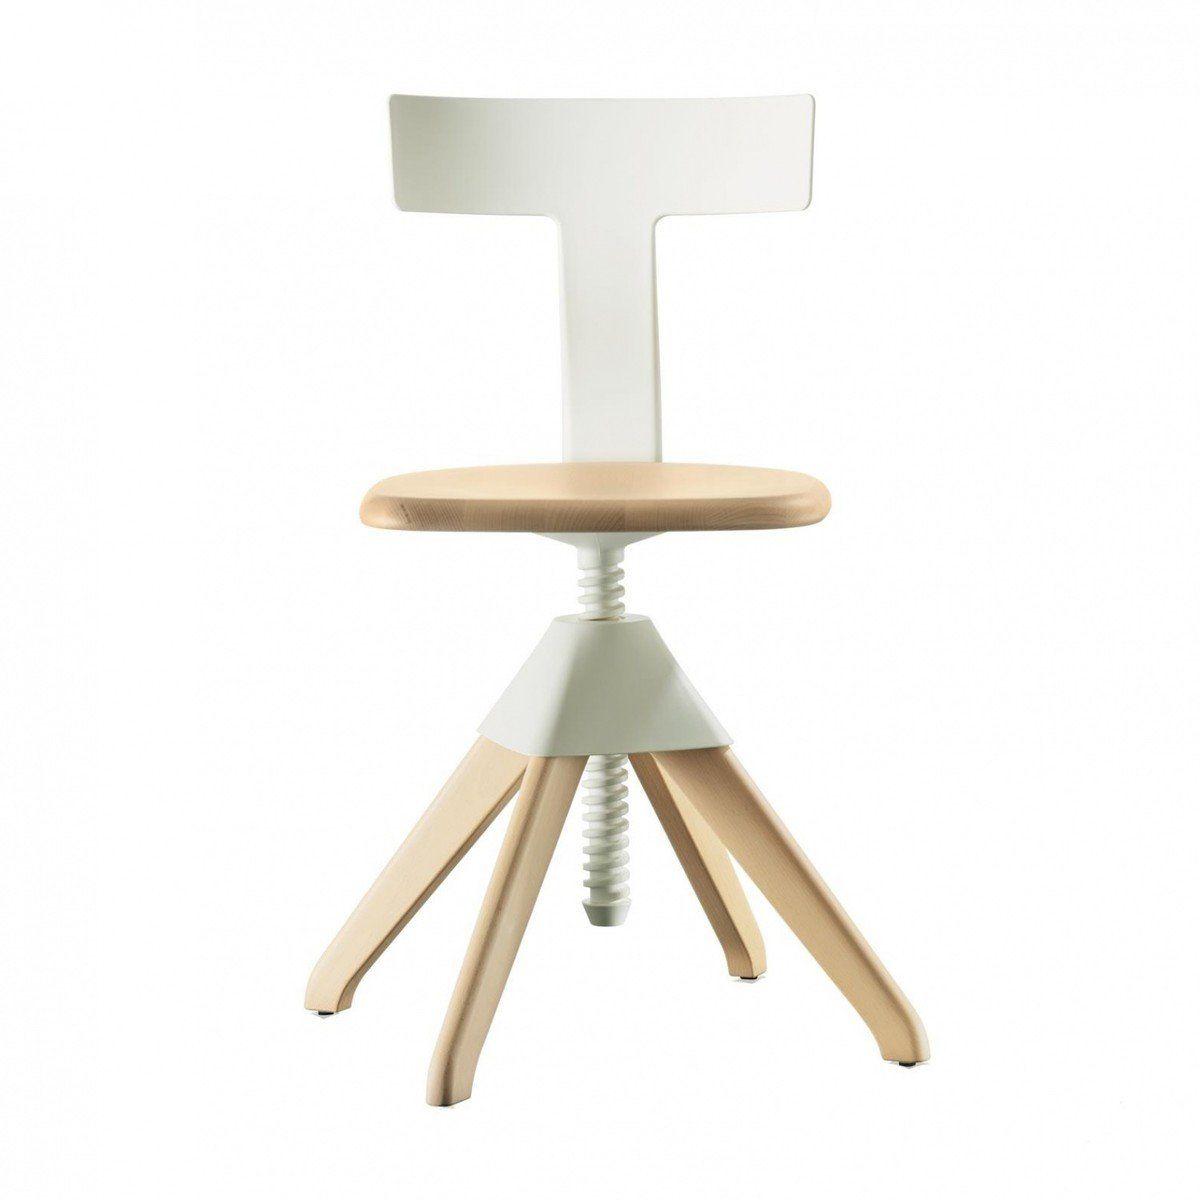 Magis   Tuffy The Wild Bunch Chair   White/frame ...